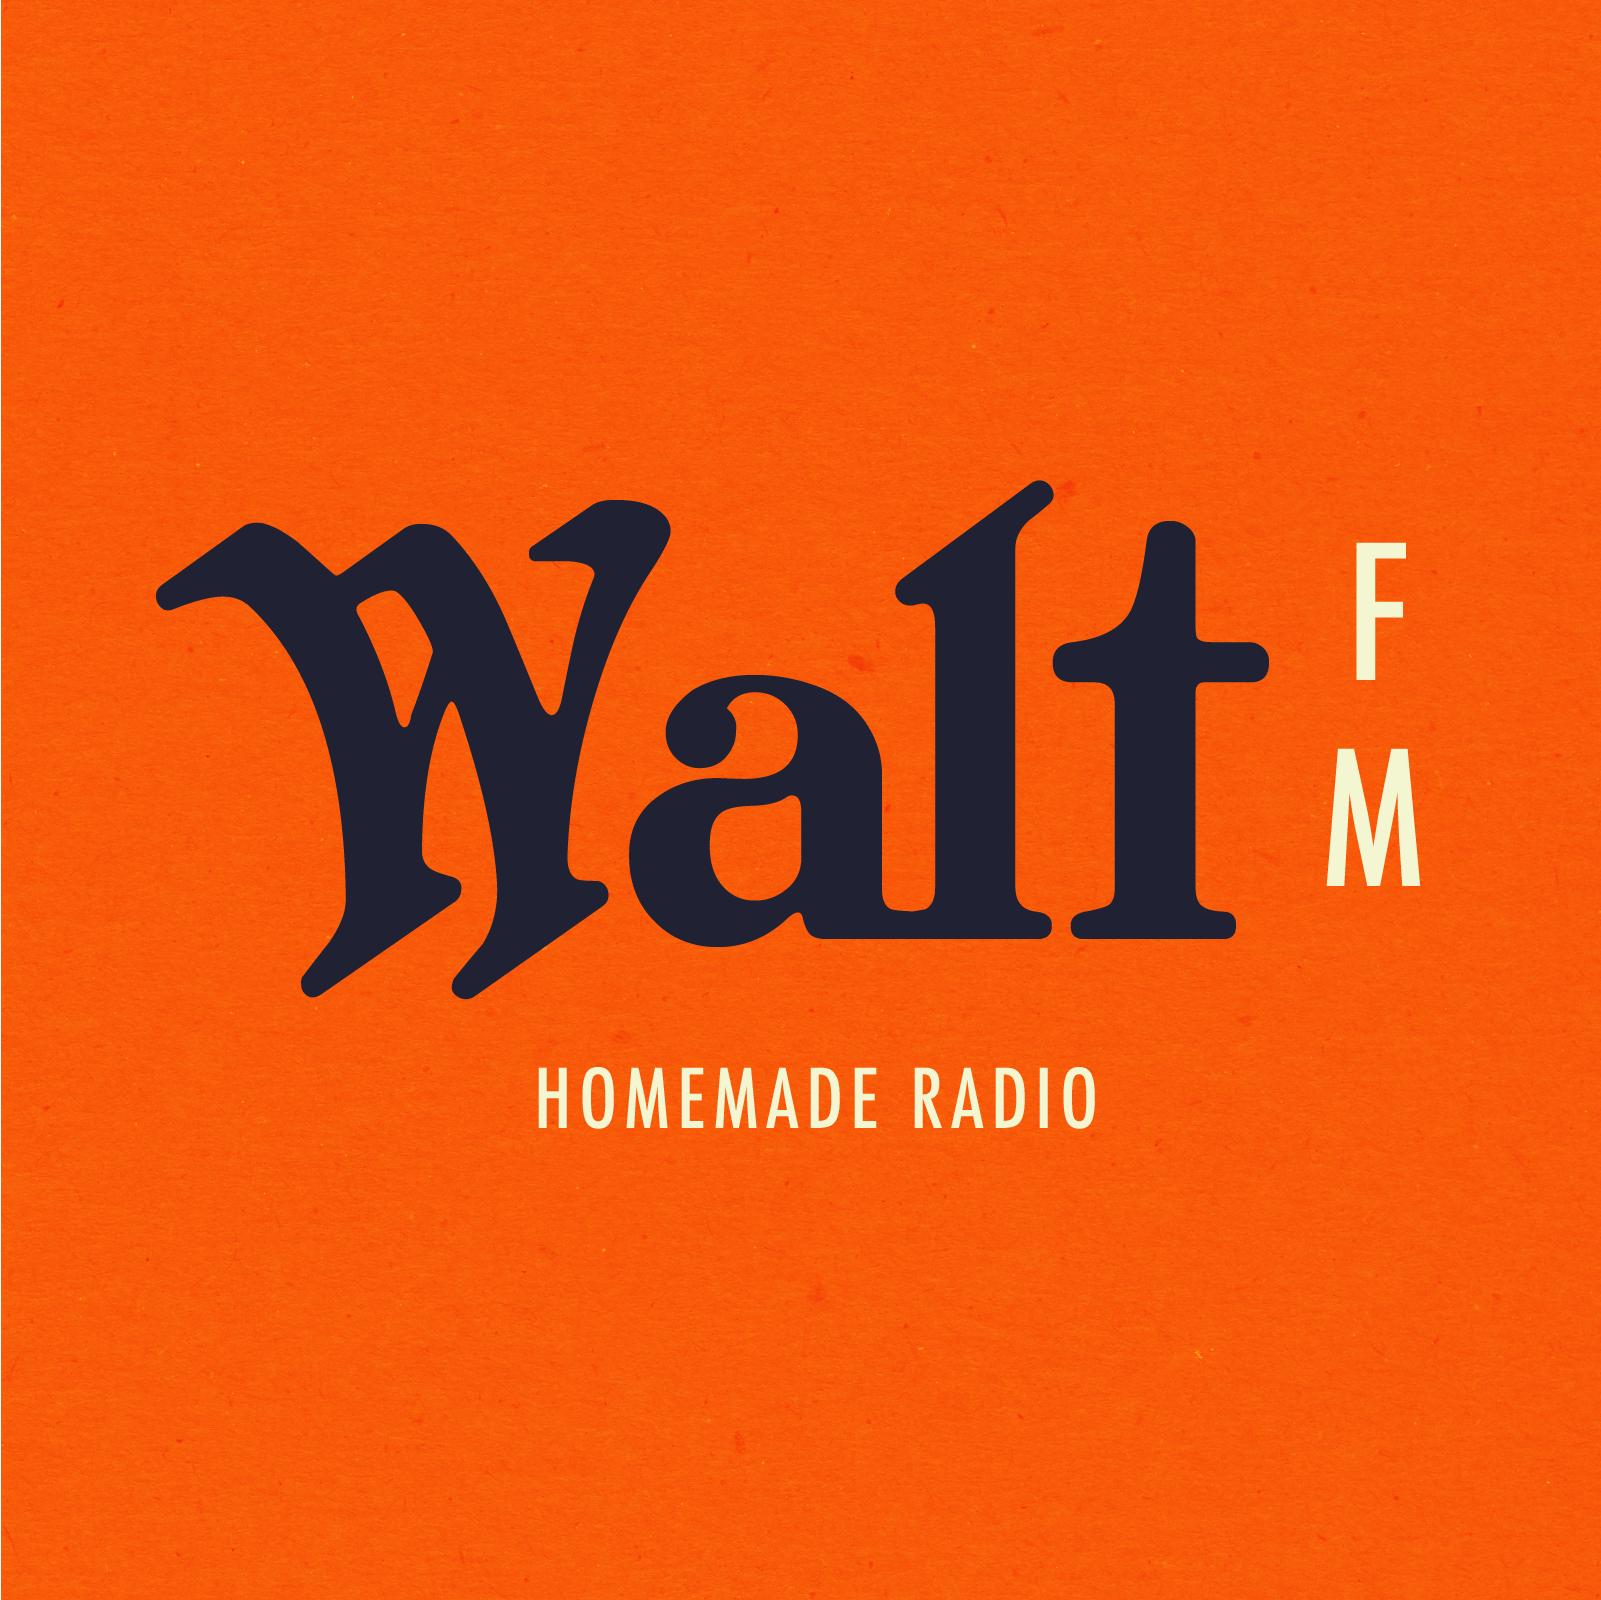 logo design by  Kat Catmur